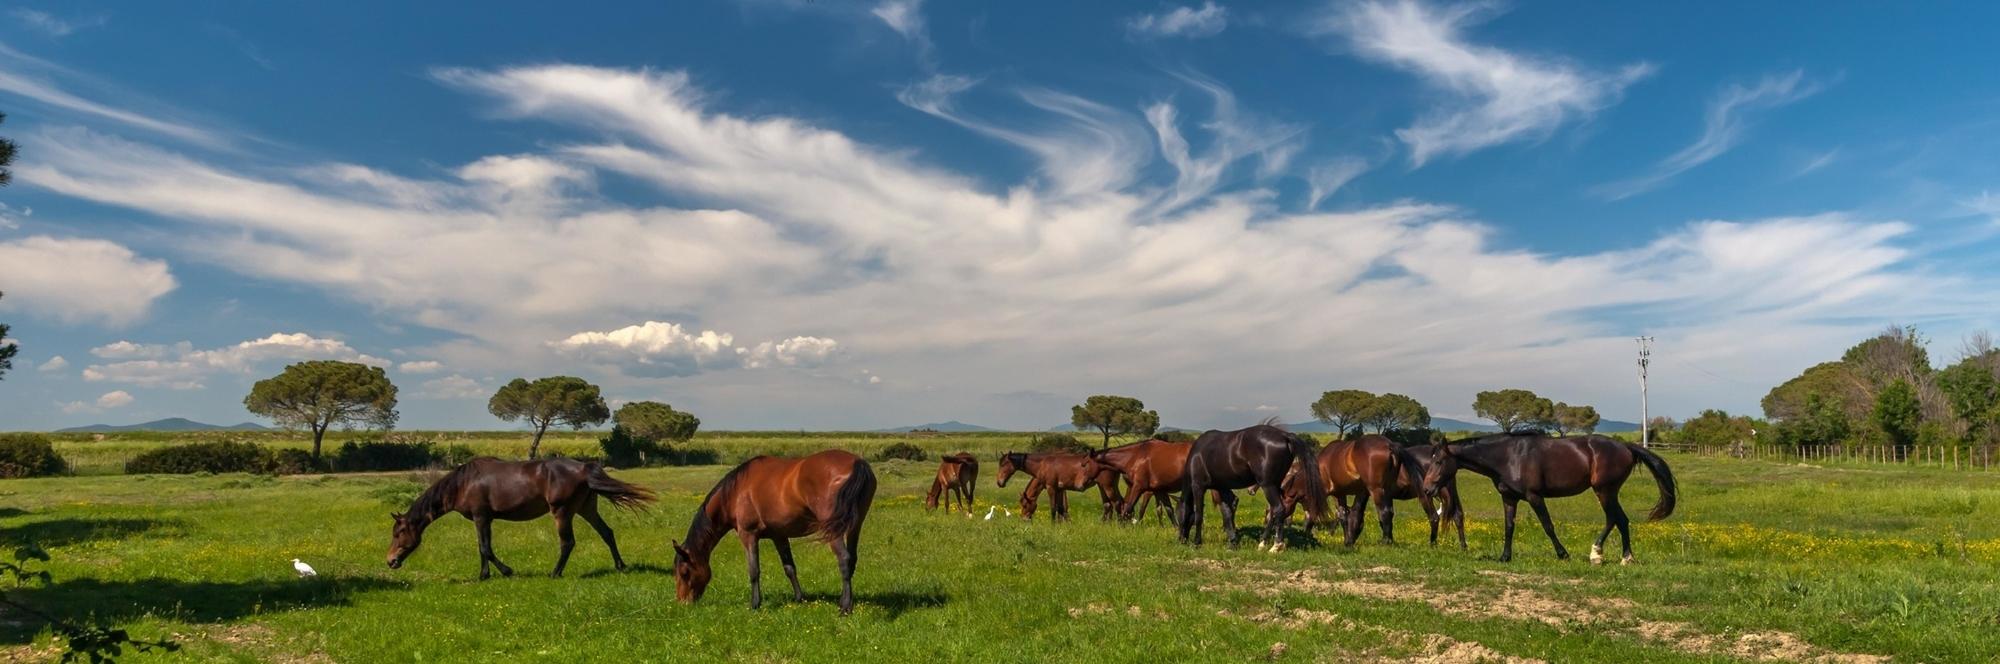 Horse Property Homes with Land in Sadalia, Colorado